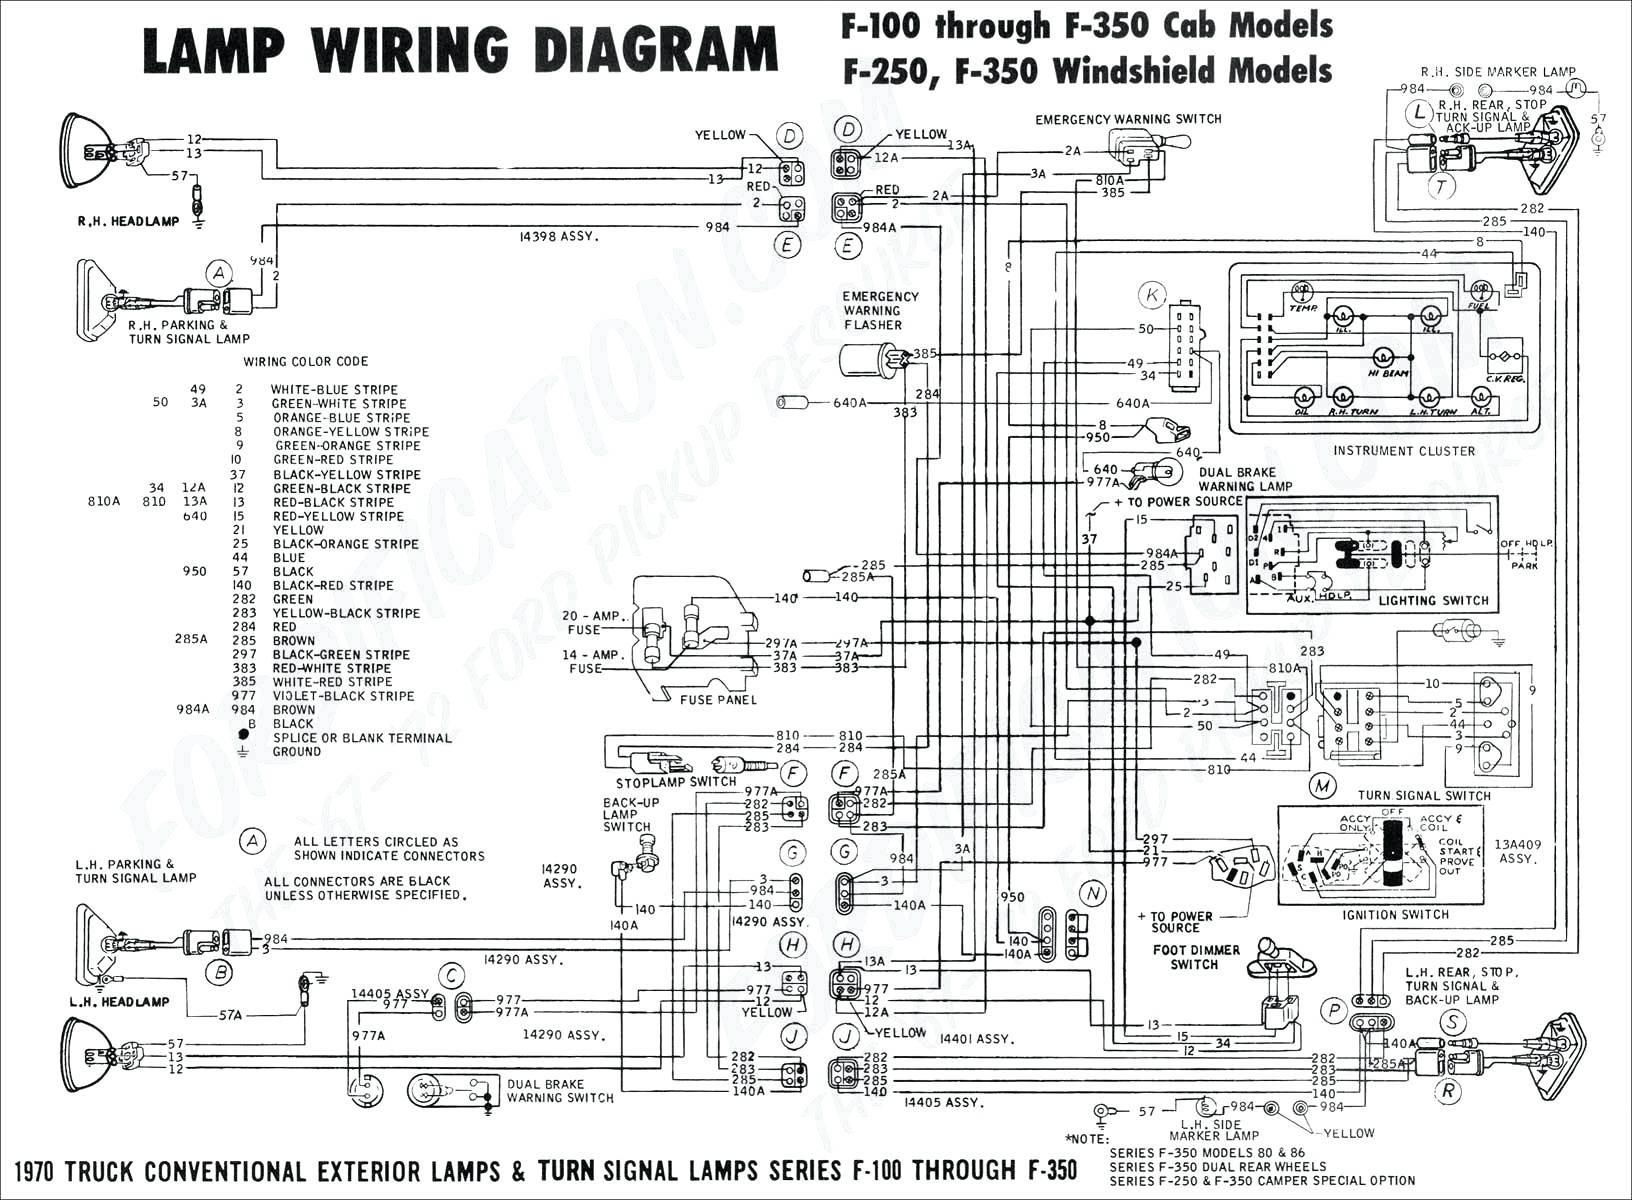 hight resolution of wiring diagram key ford focus electrical conversion binatanicom wiring diagram suzuki gs500e electric motorcycle system binatanicom